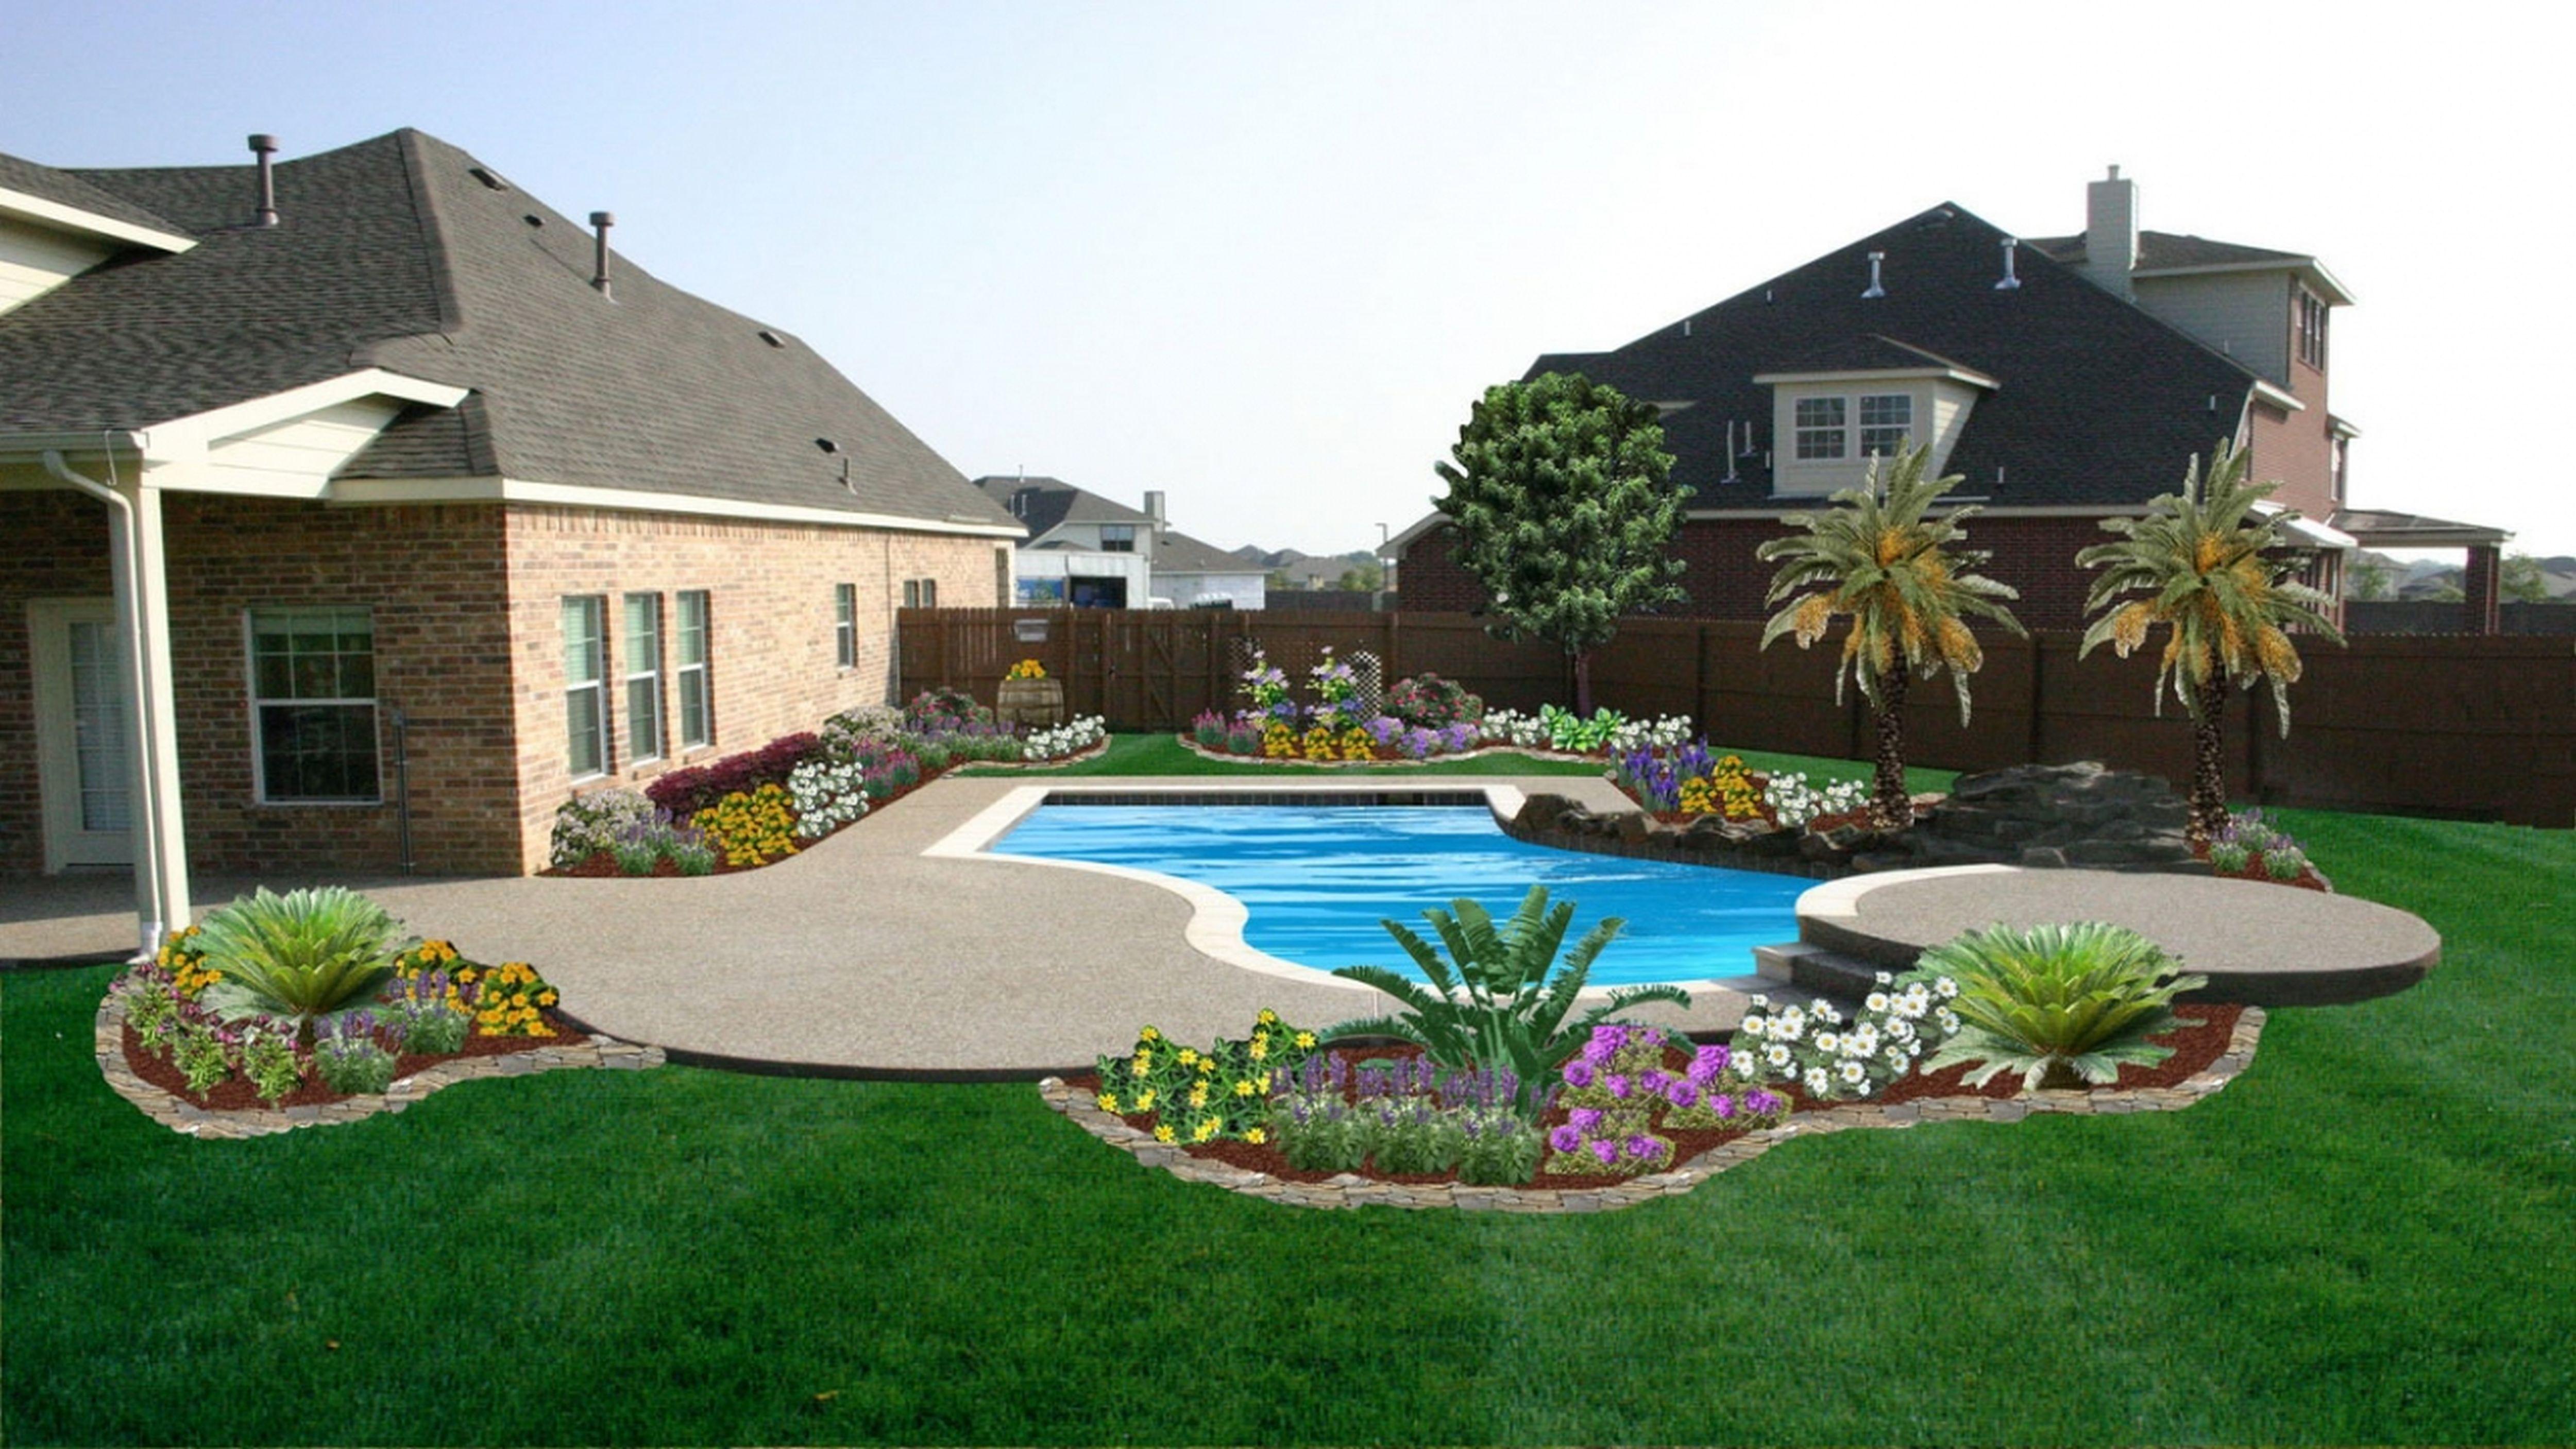 Inspiring Front Yard Landscaping Photos Design